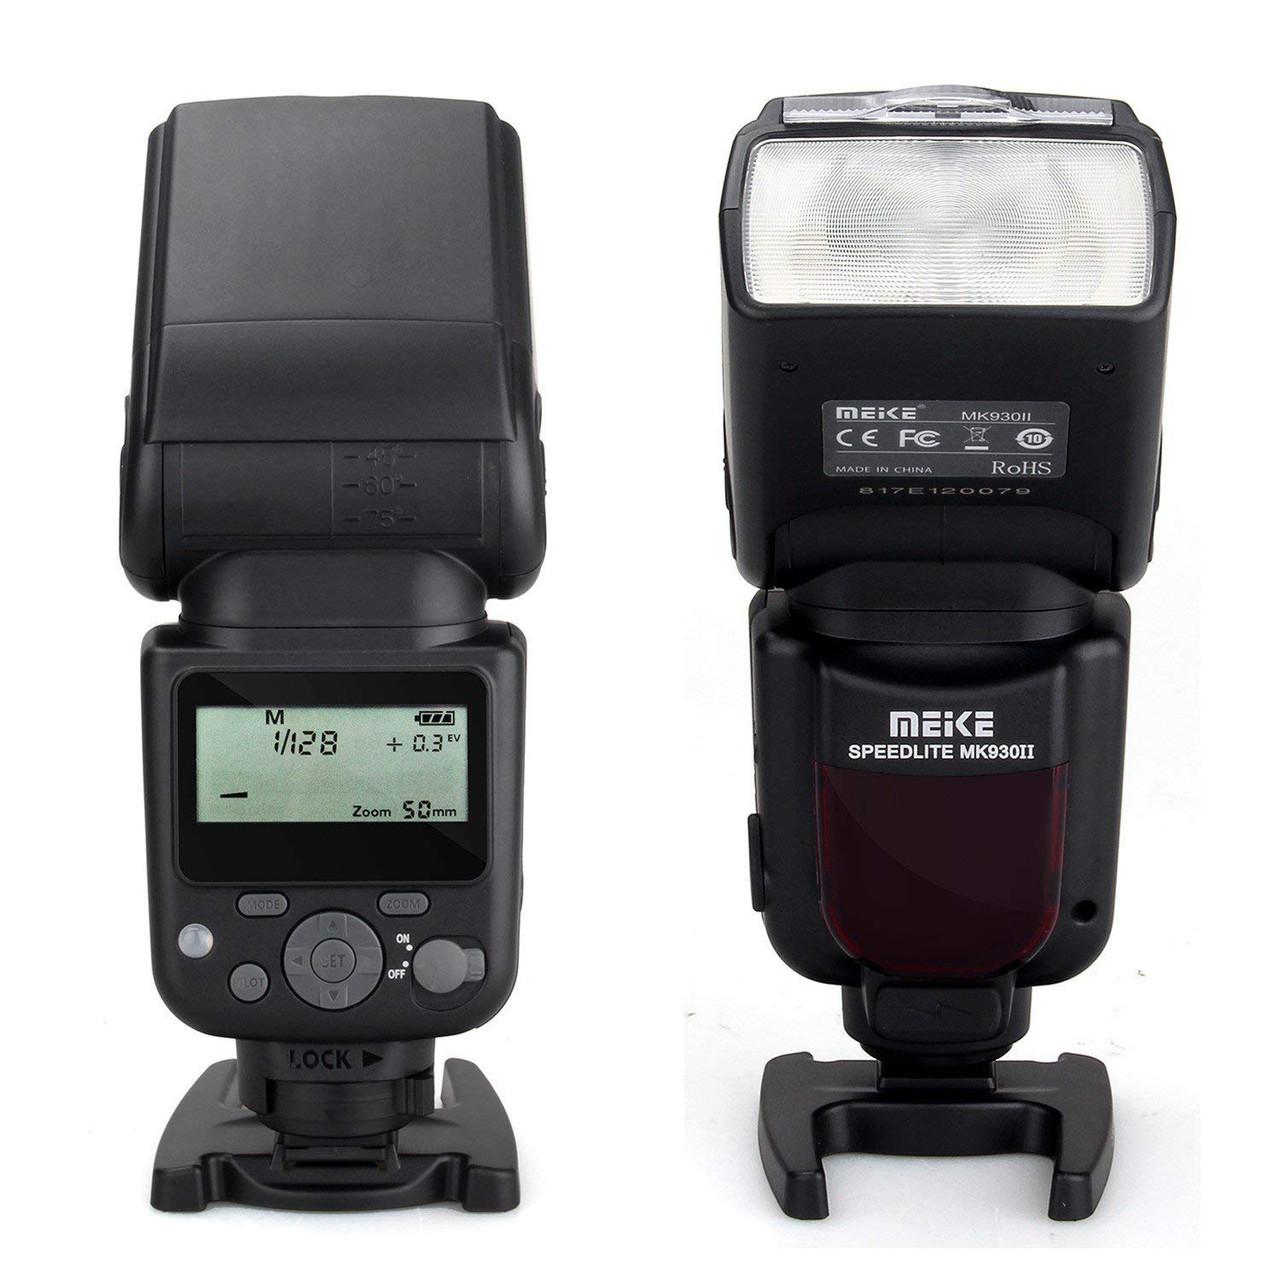 Вспышка Meike Speedlite MK-930 Mark II (для Canon, Nikon, Sony, Olympus и др.)